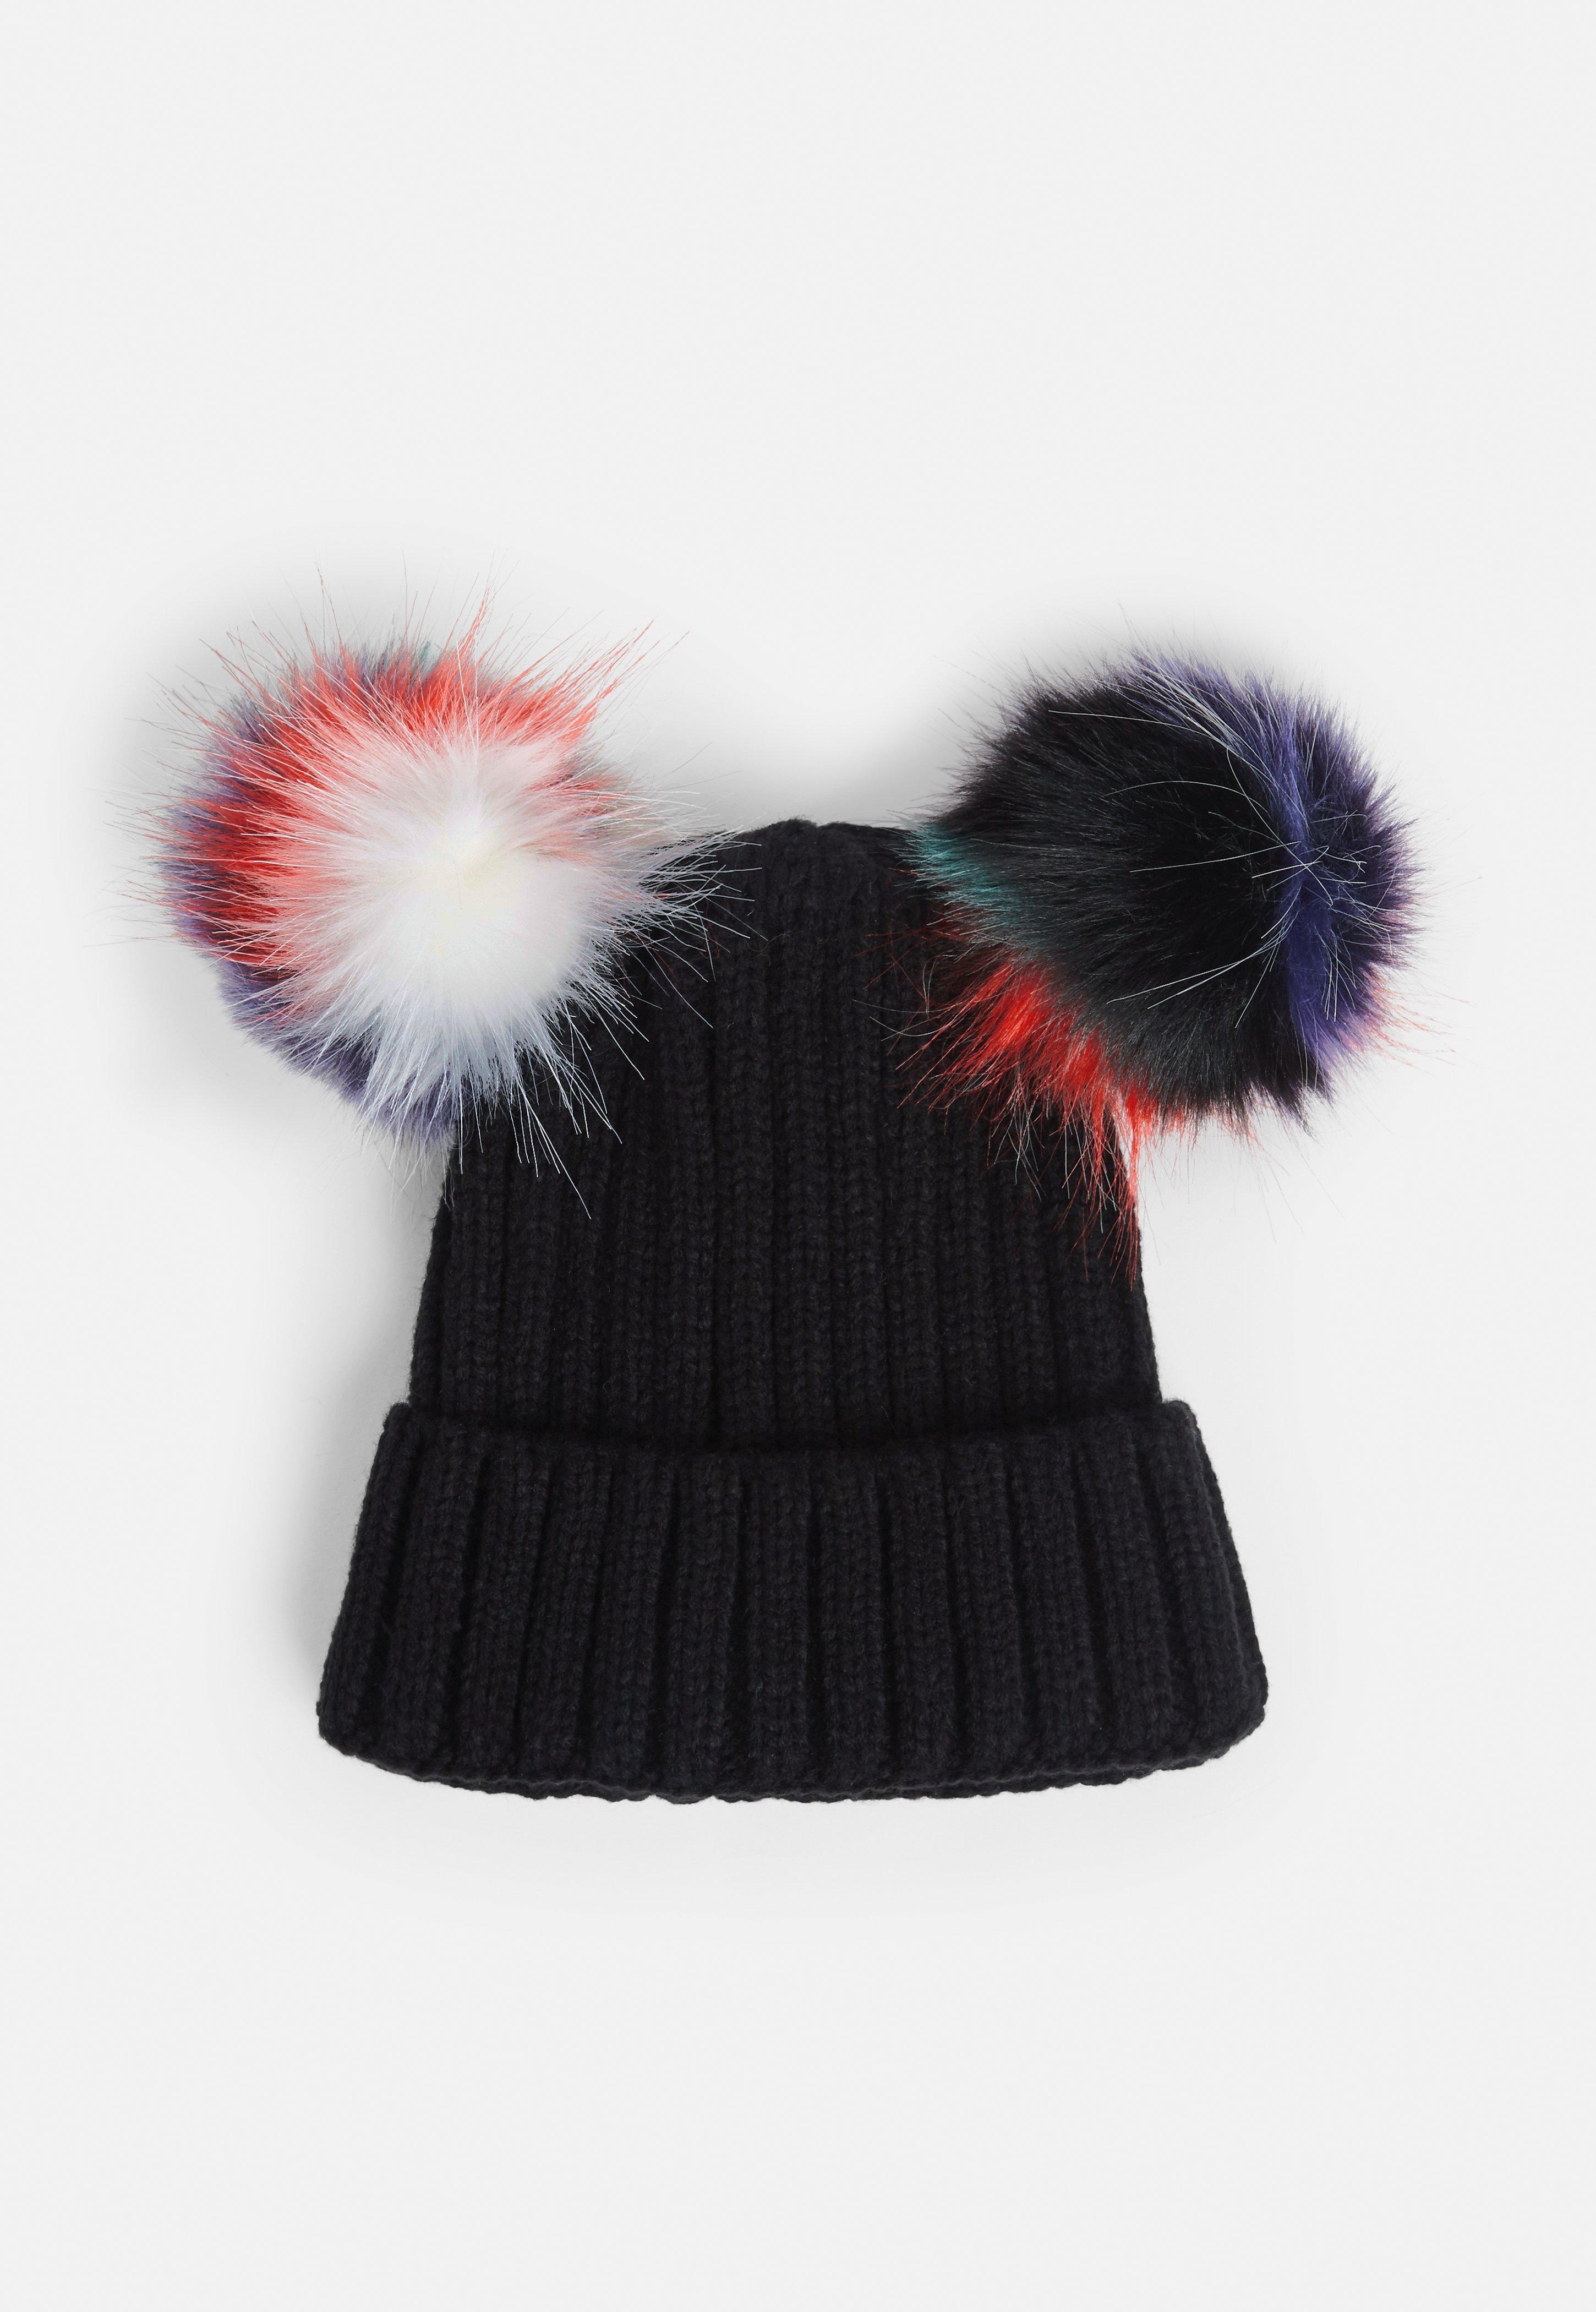 beae735f9b5 Missguided Black Beanie Hat in Black - Lyst